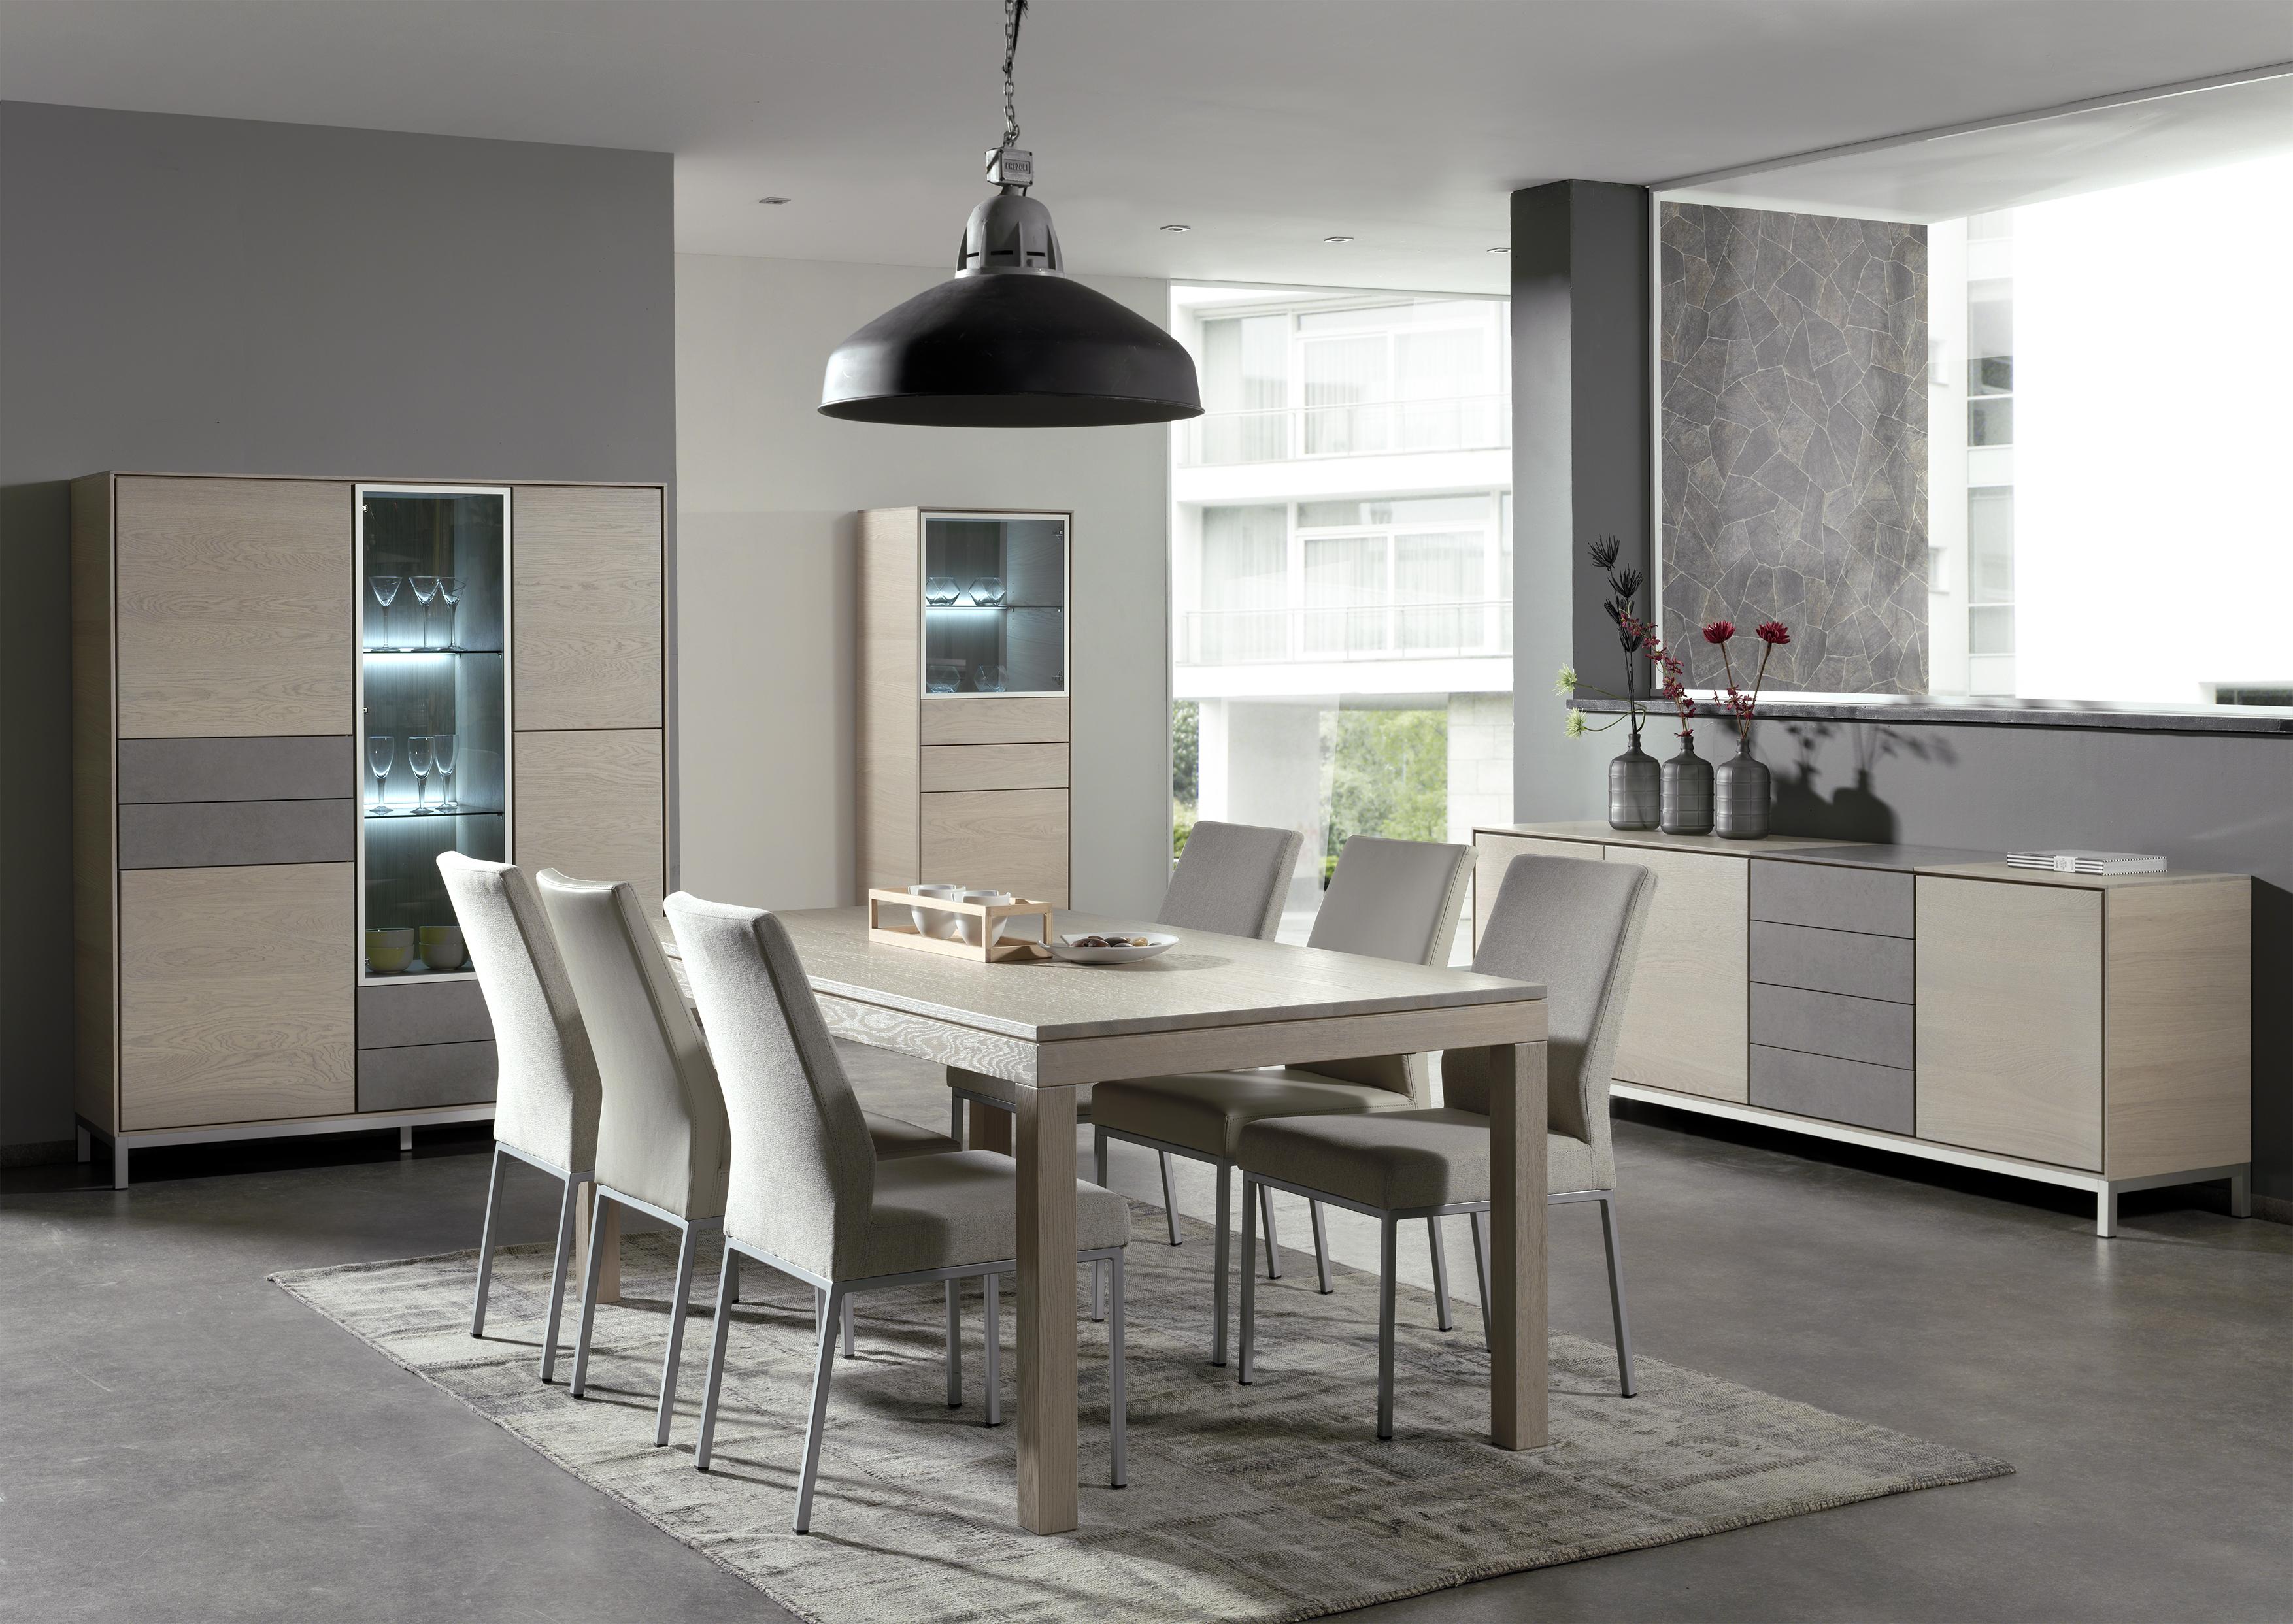 Eetkamer t08mo meubelen joremeubelen jore - Moderne eetkamer ...